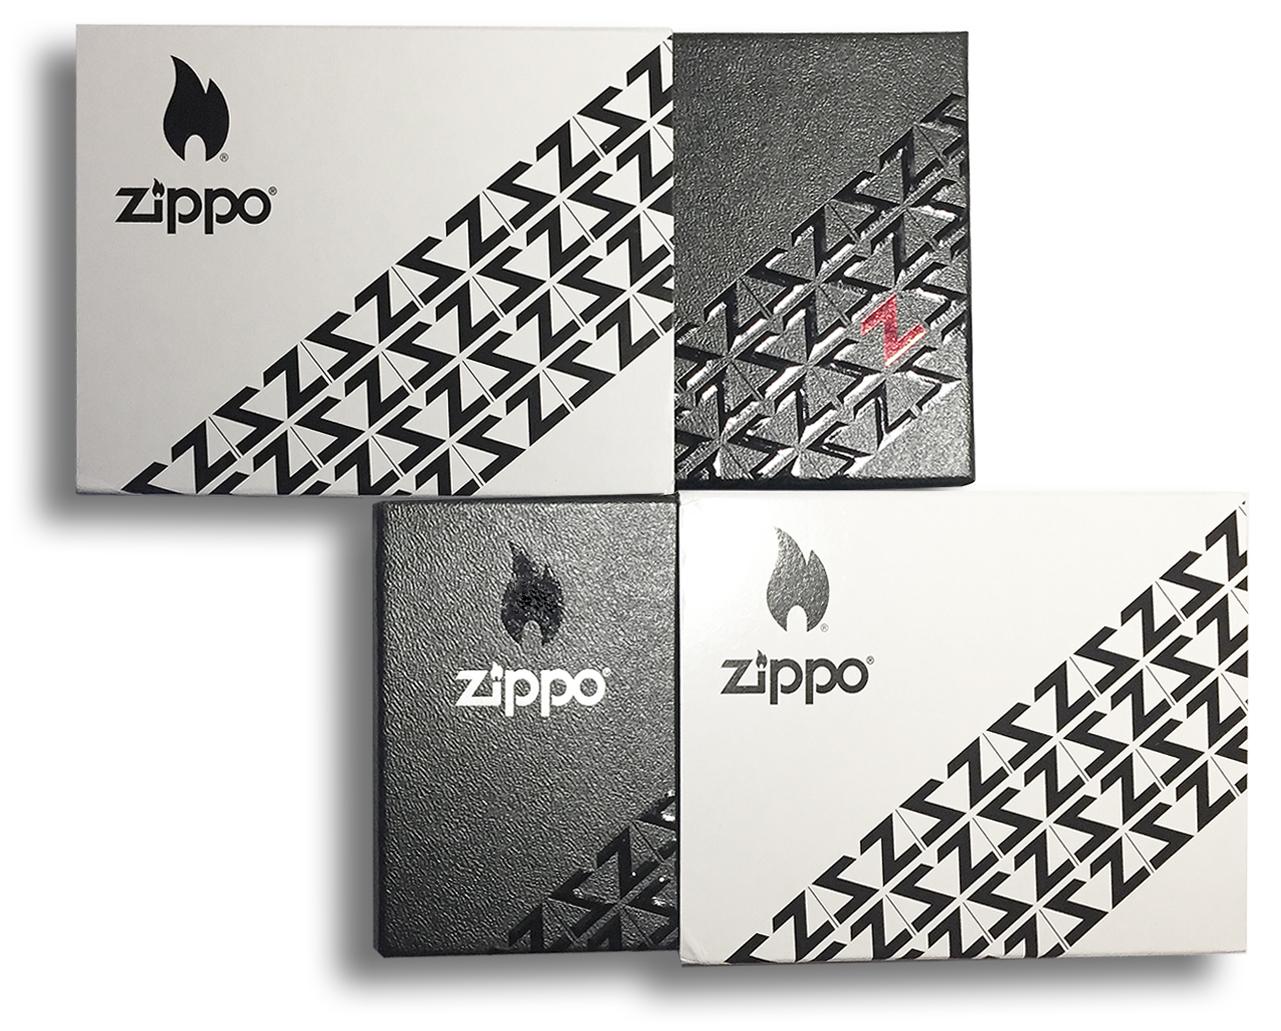 Упаковка для зажигалок Zippo класса люкс